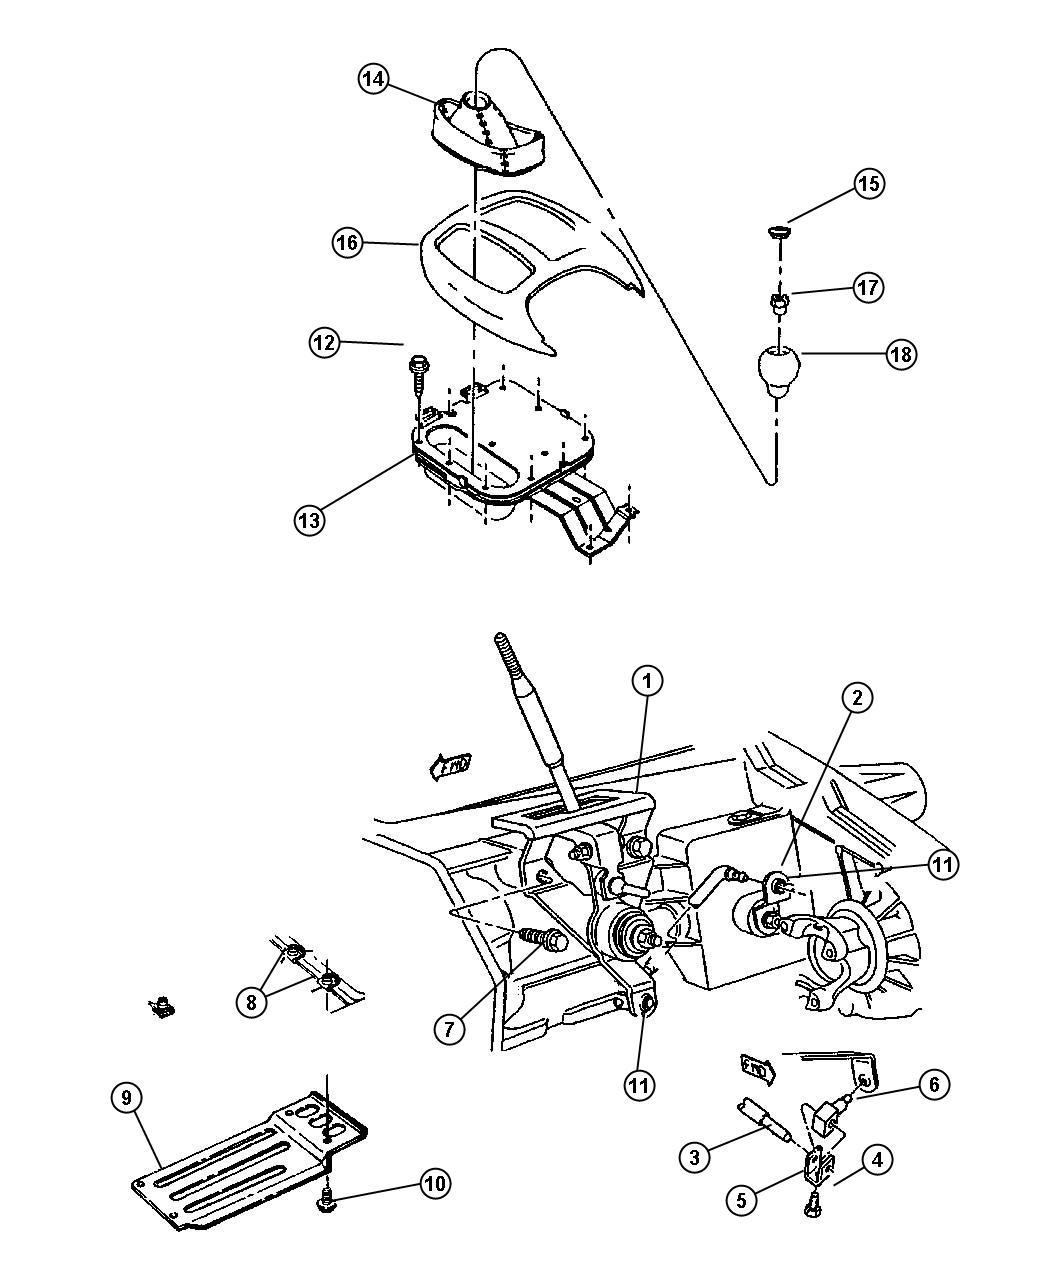 Dodge Dakota Gearshift Controls Shift On The Fly Dhk